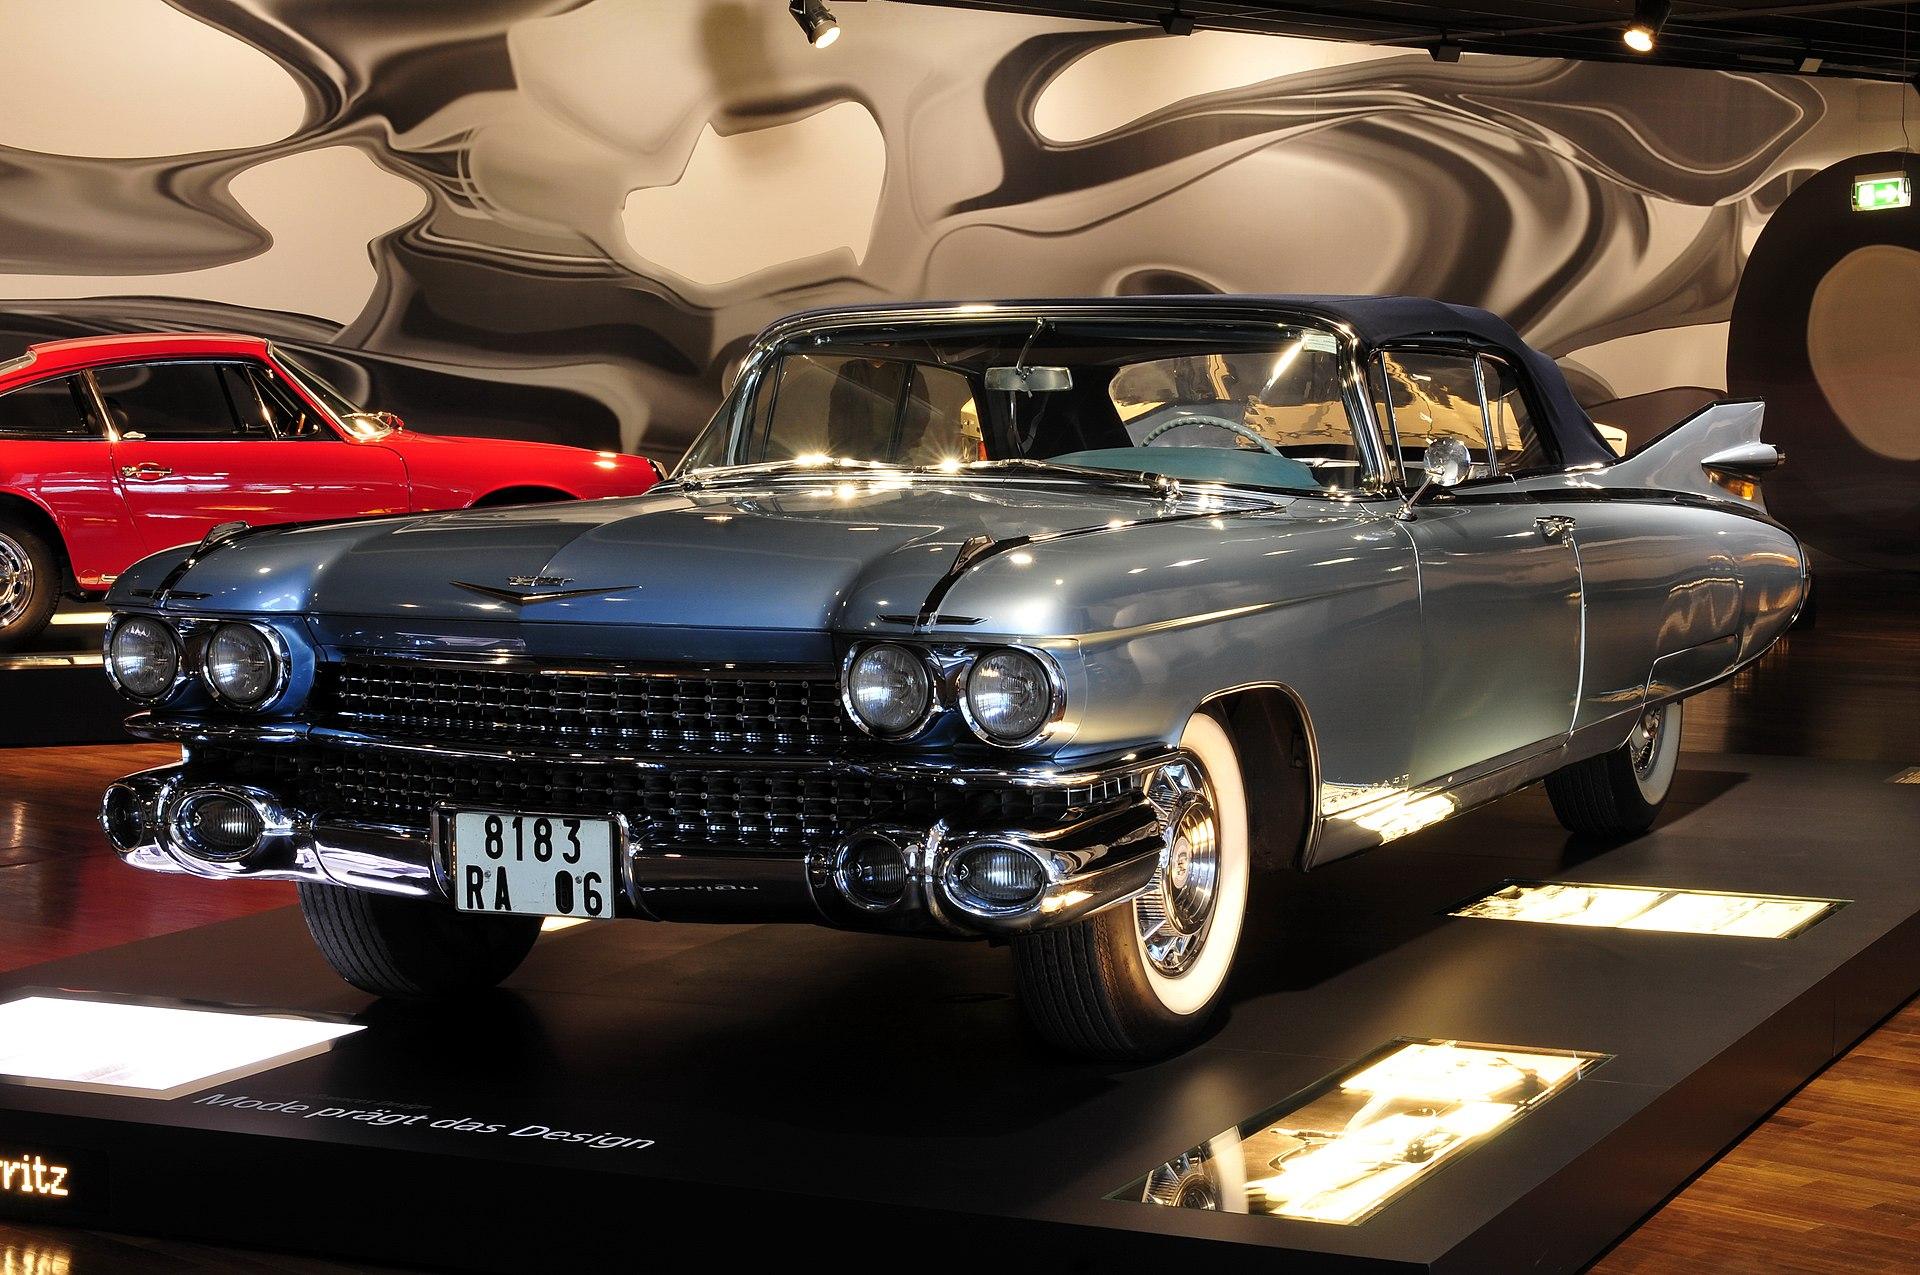 56 Buick Wiring Diagram Cadillac Eldorado Wikipedia